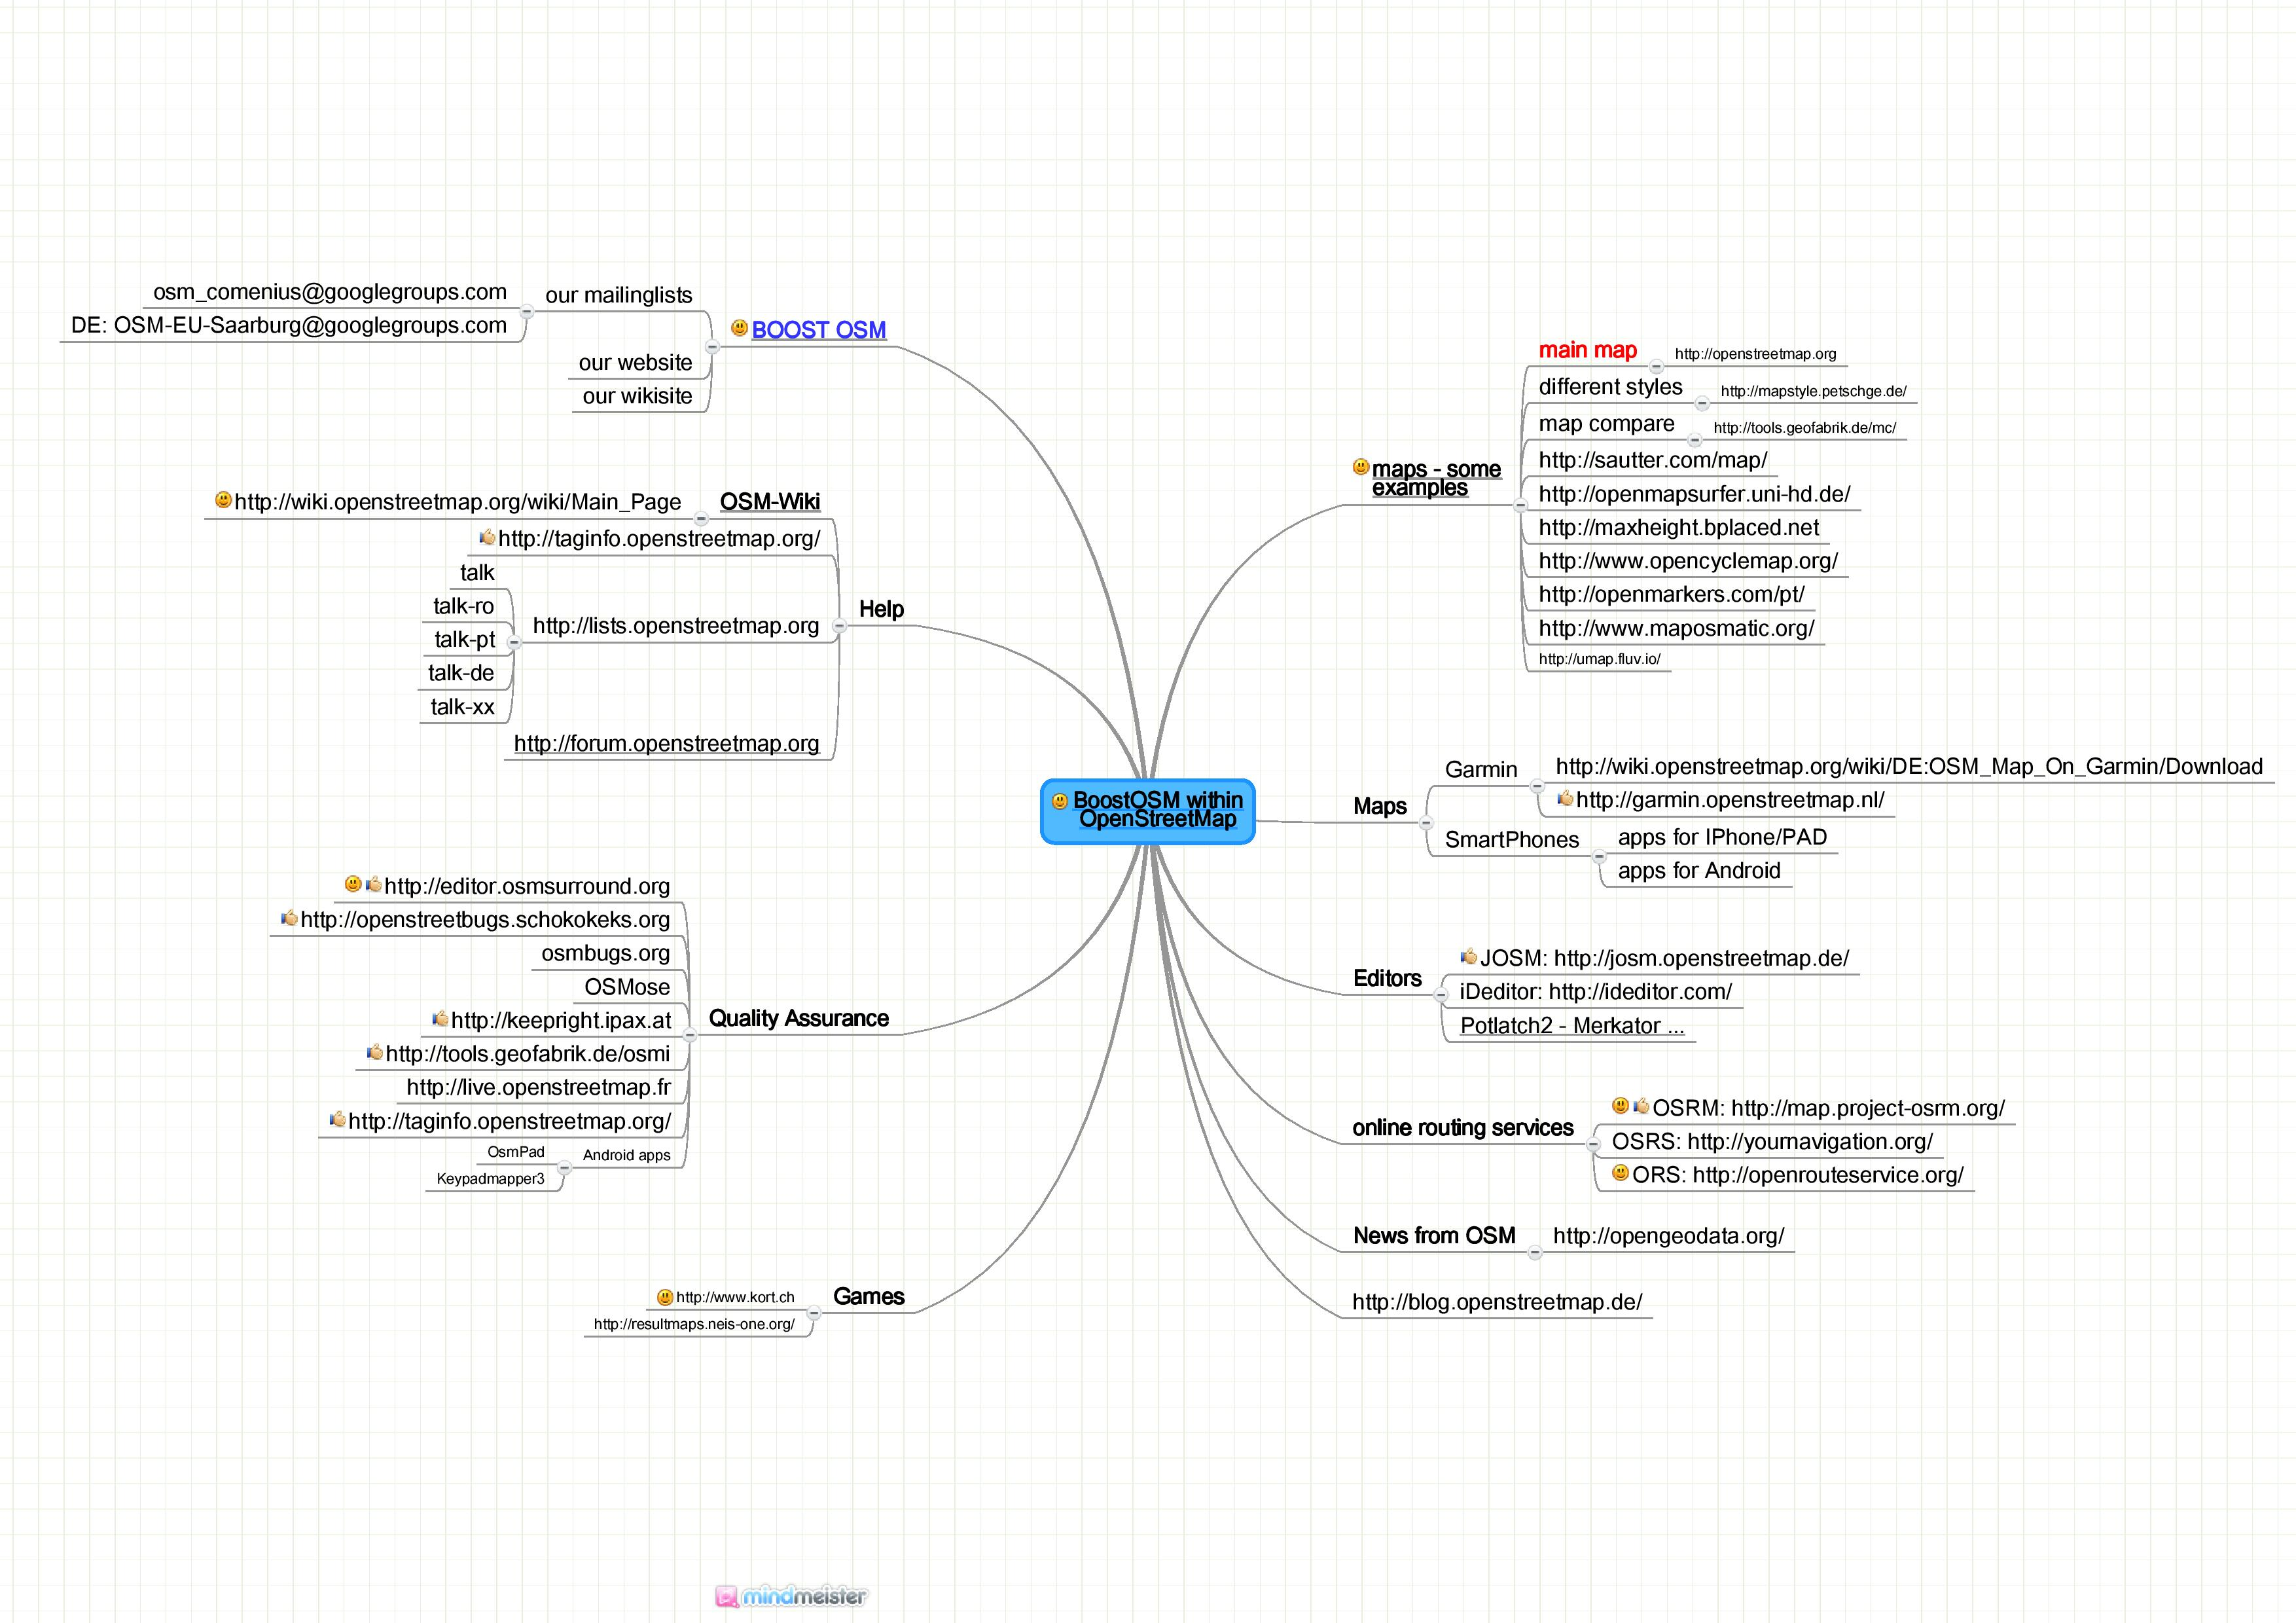 знакомство с проектом openstreetmap примеры